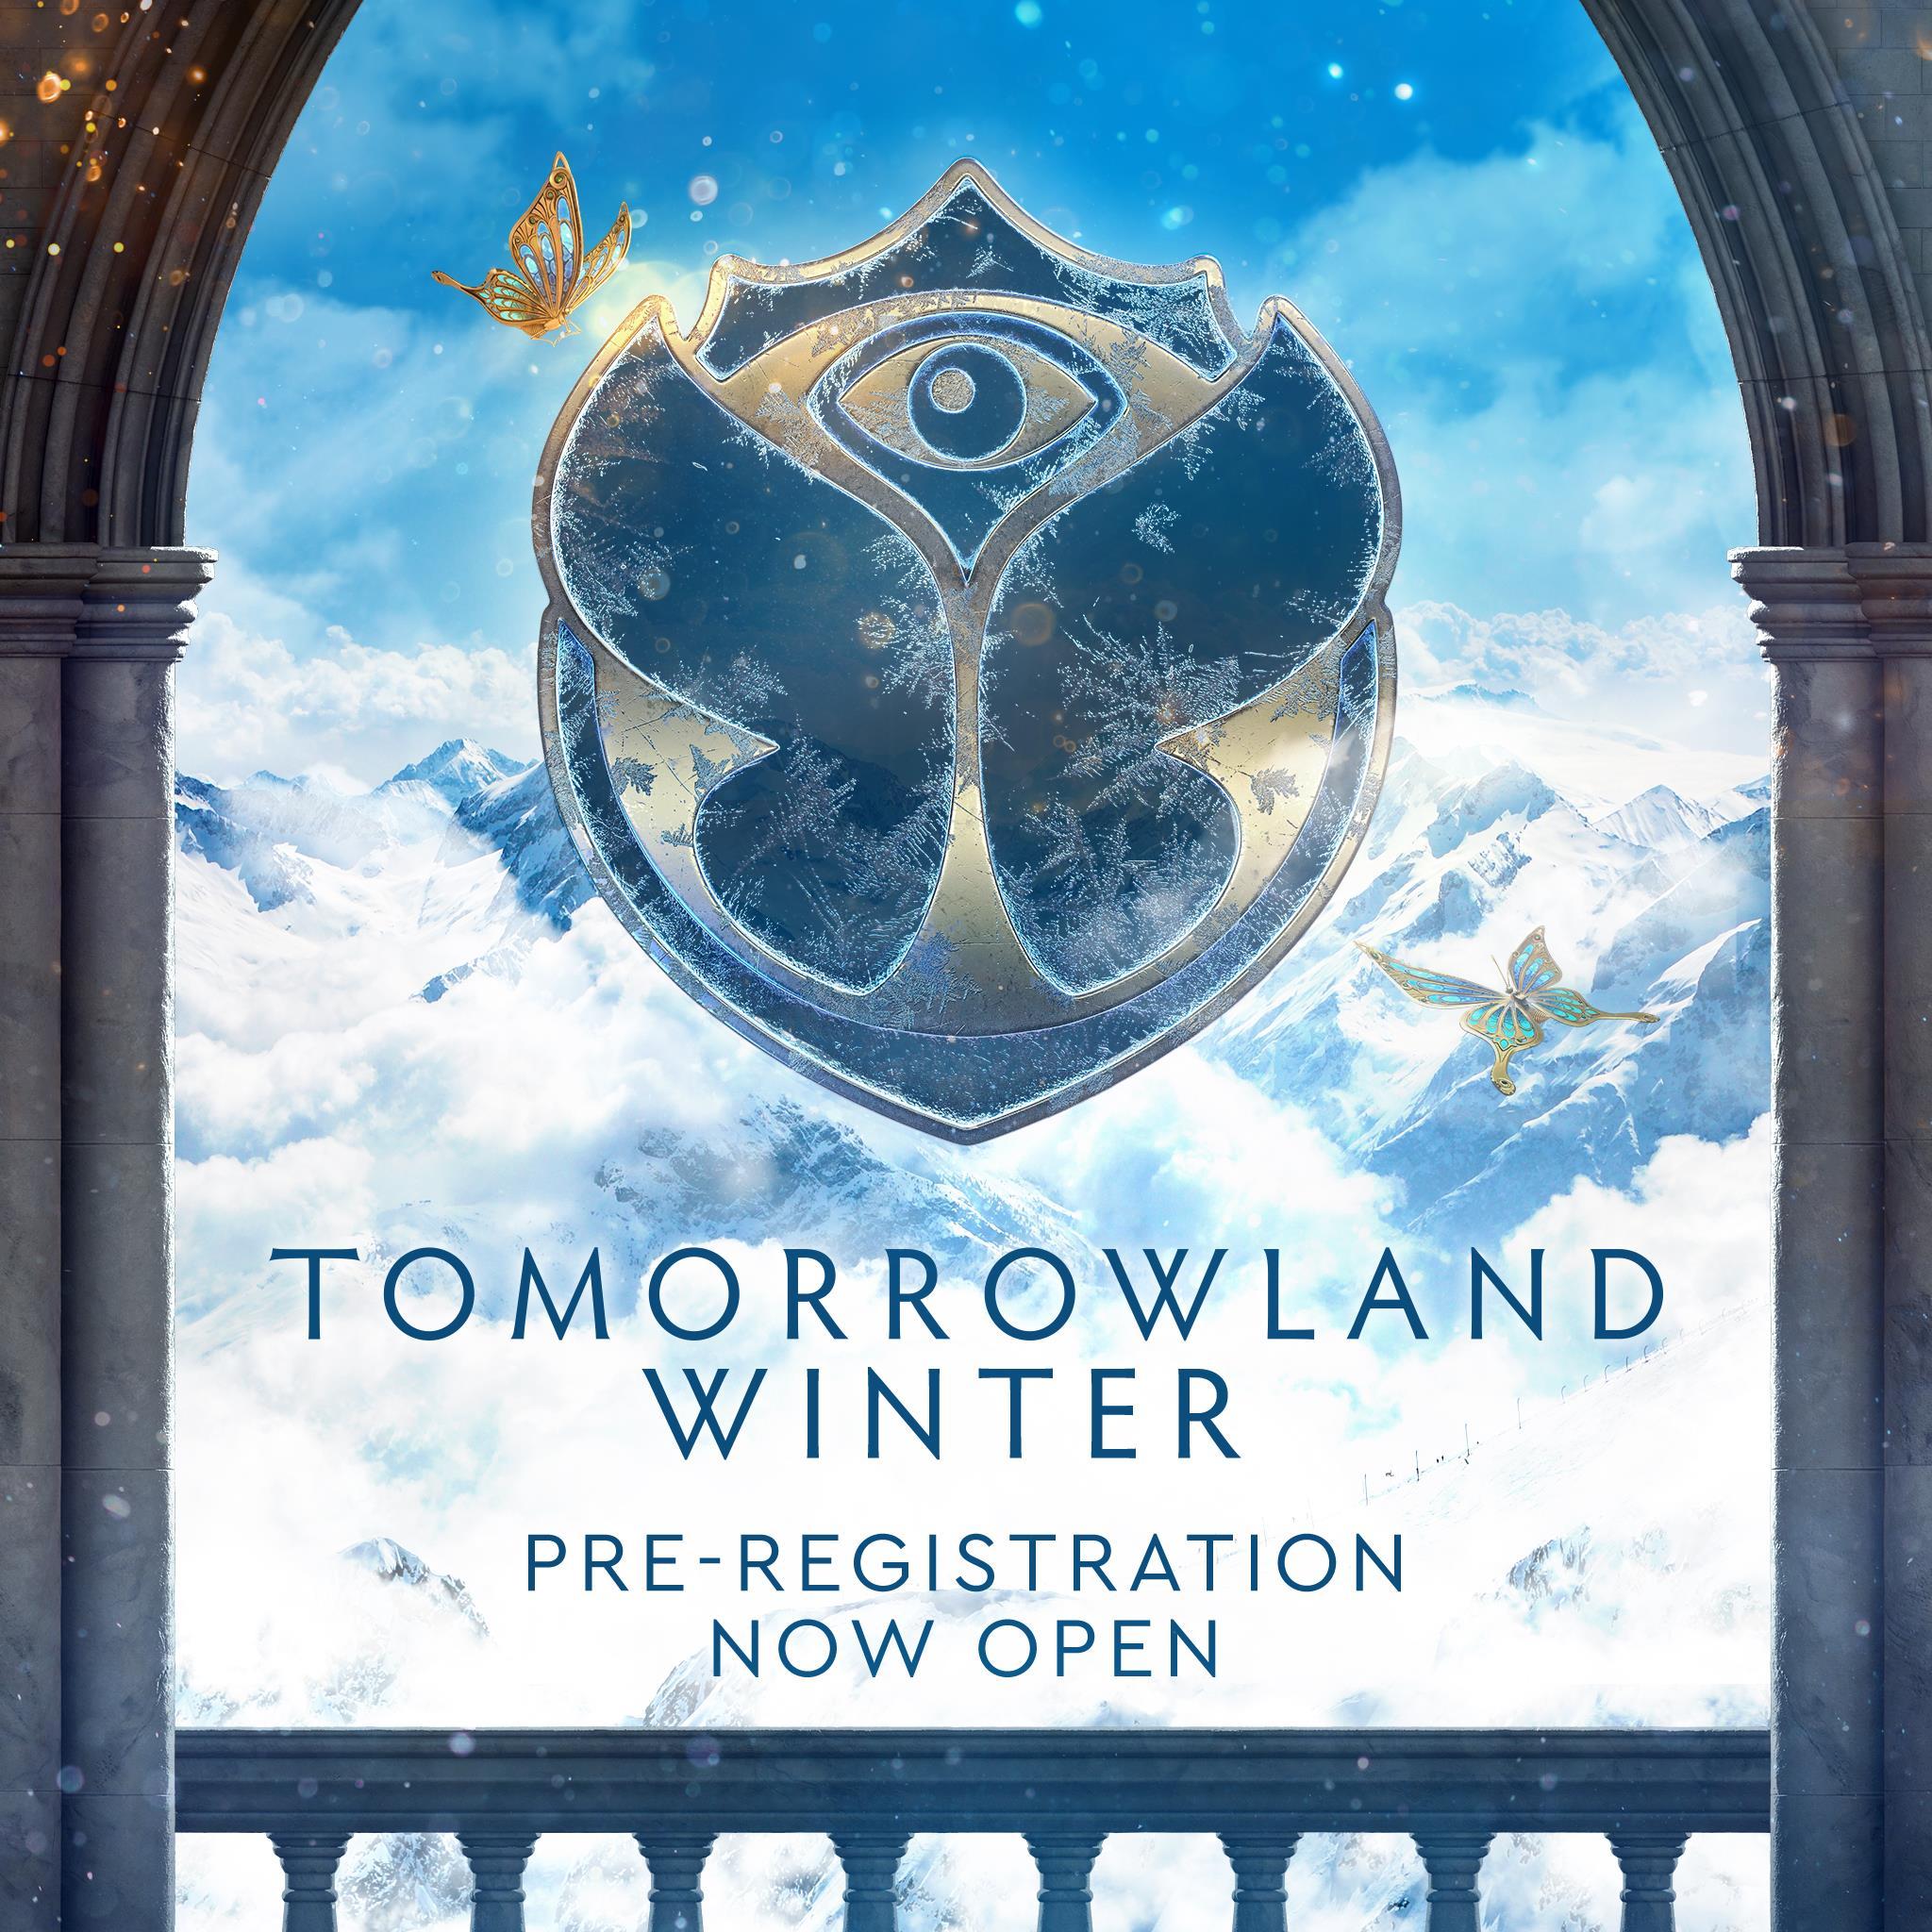 Tomorrowland winter, Tomorrowland winter 2019